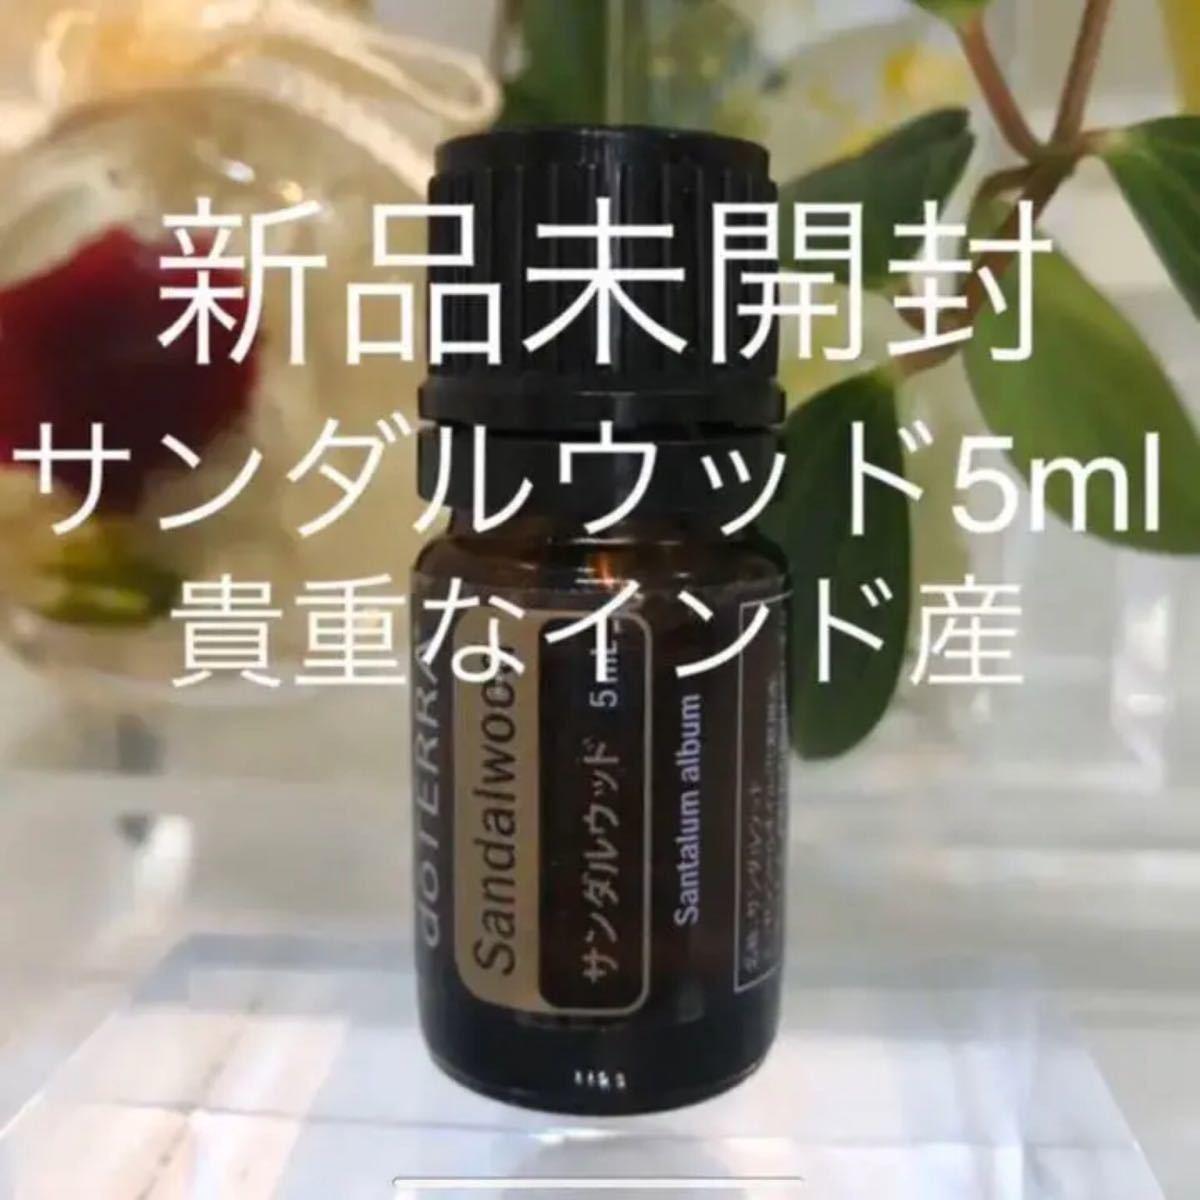 starlily 様専用ページ/ドテラ